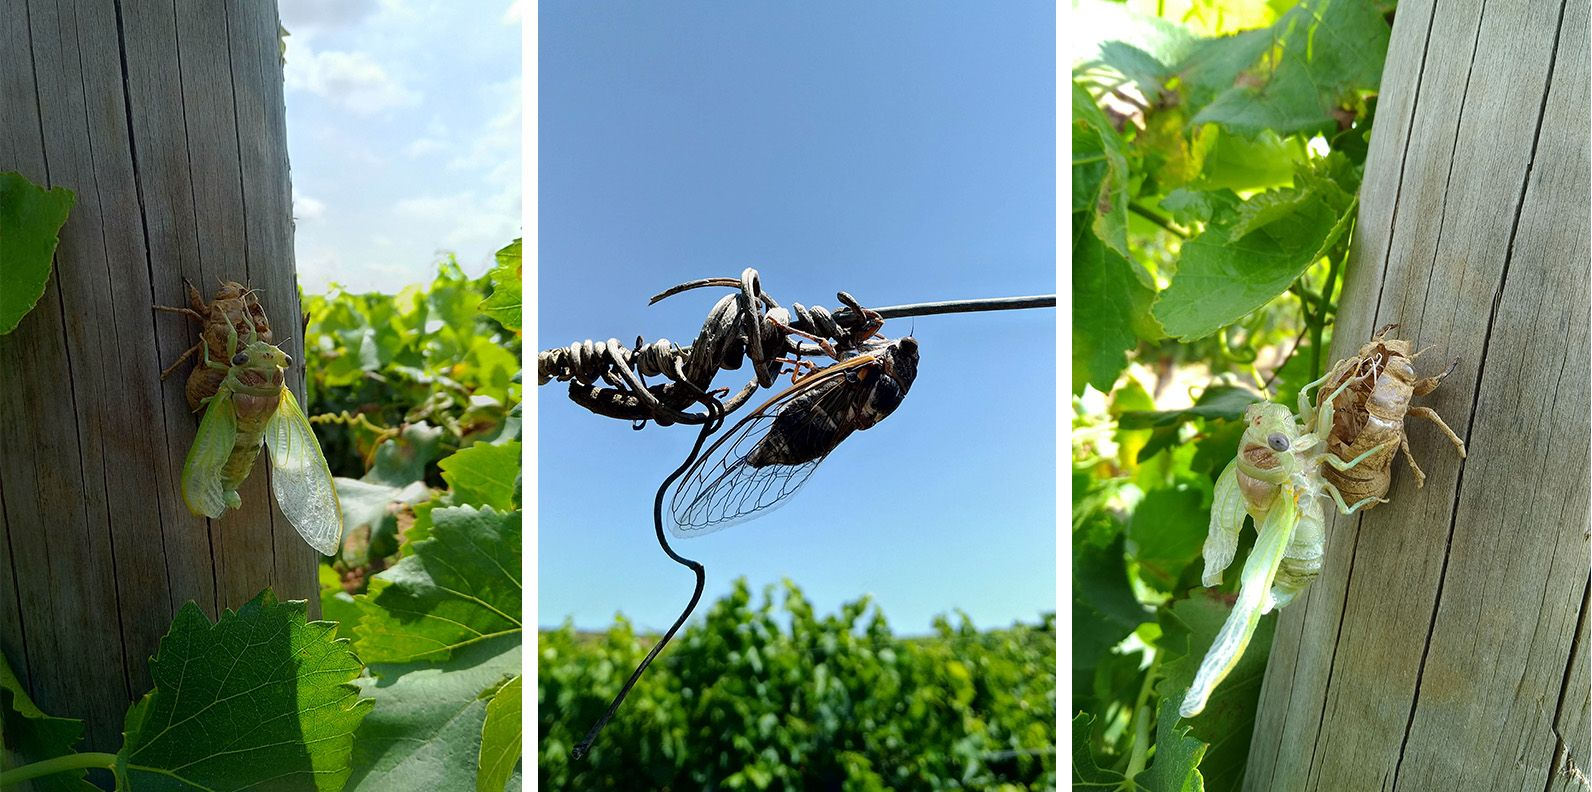 bassac insects having fun